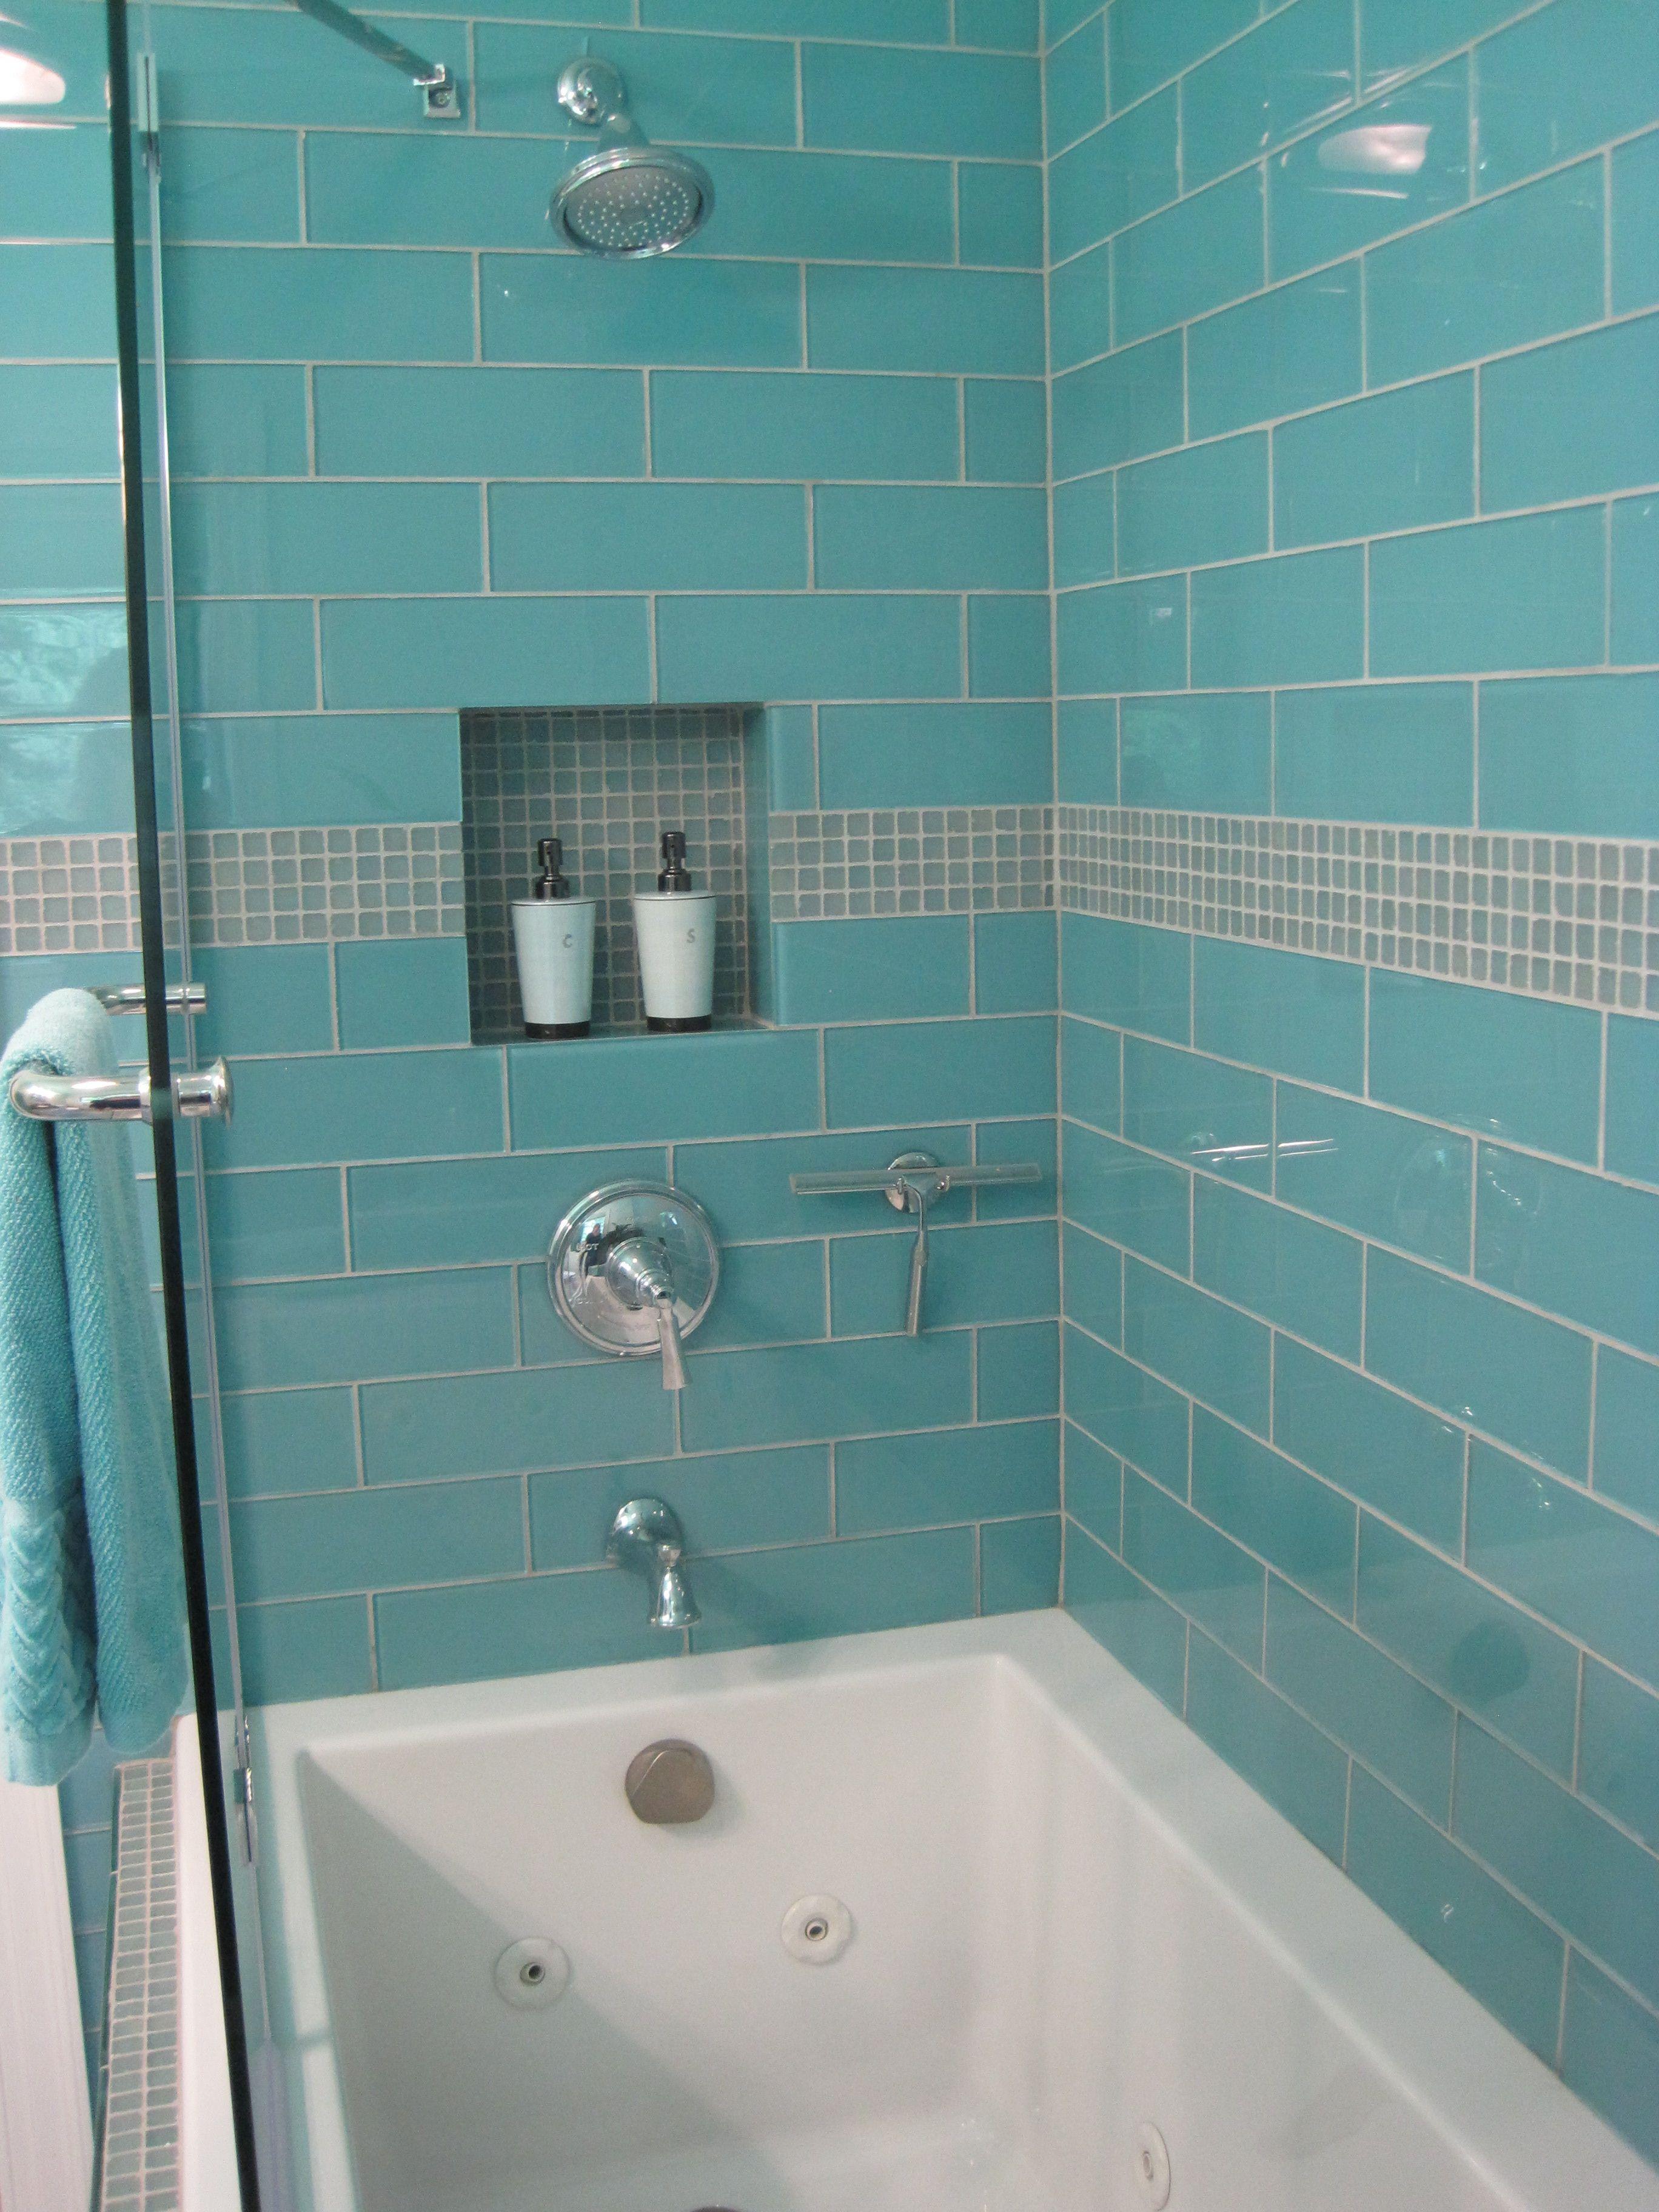 Aqua 4 X 12 Large Glass Subway Tile Shower Enclosure Small Bathroom Tiles Shower Tile Bathroom Wall Tile